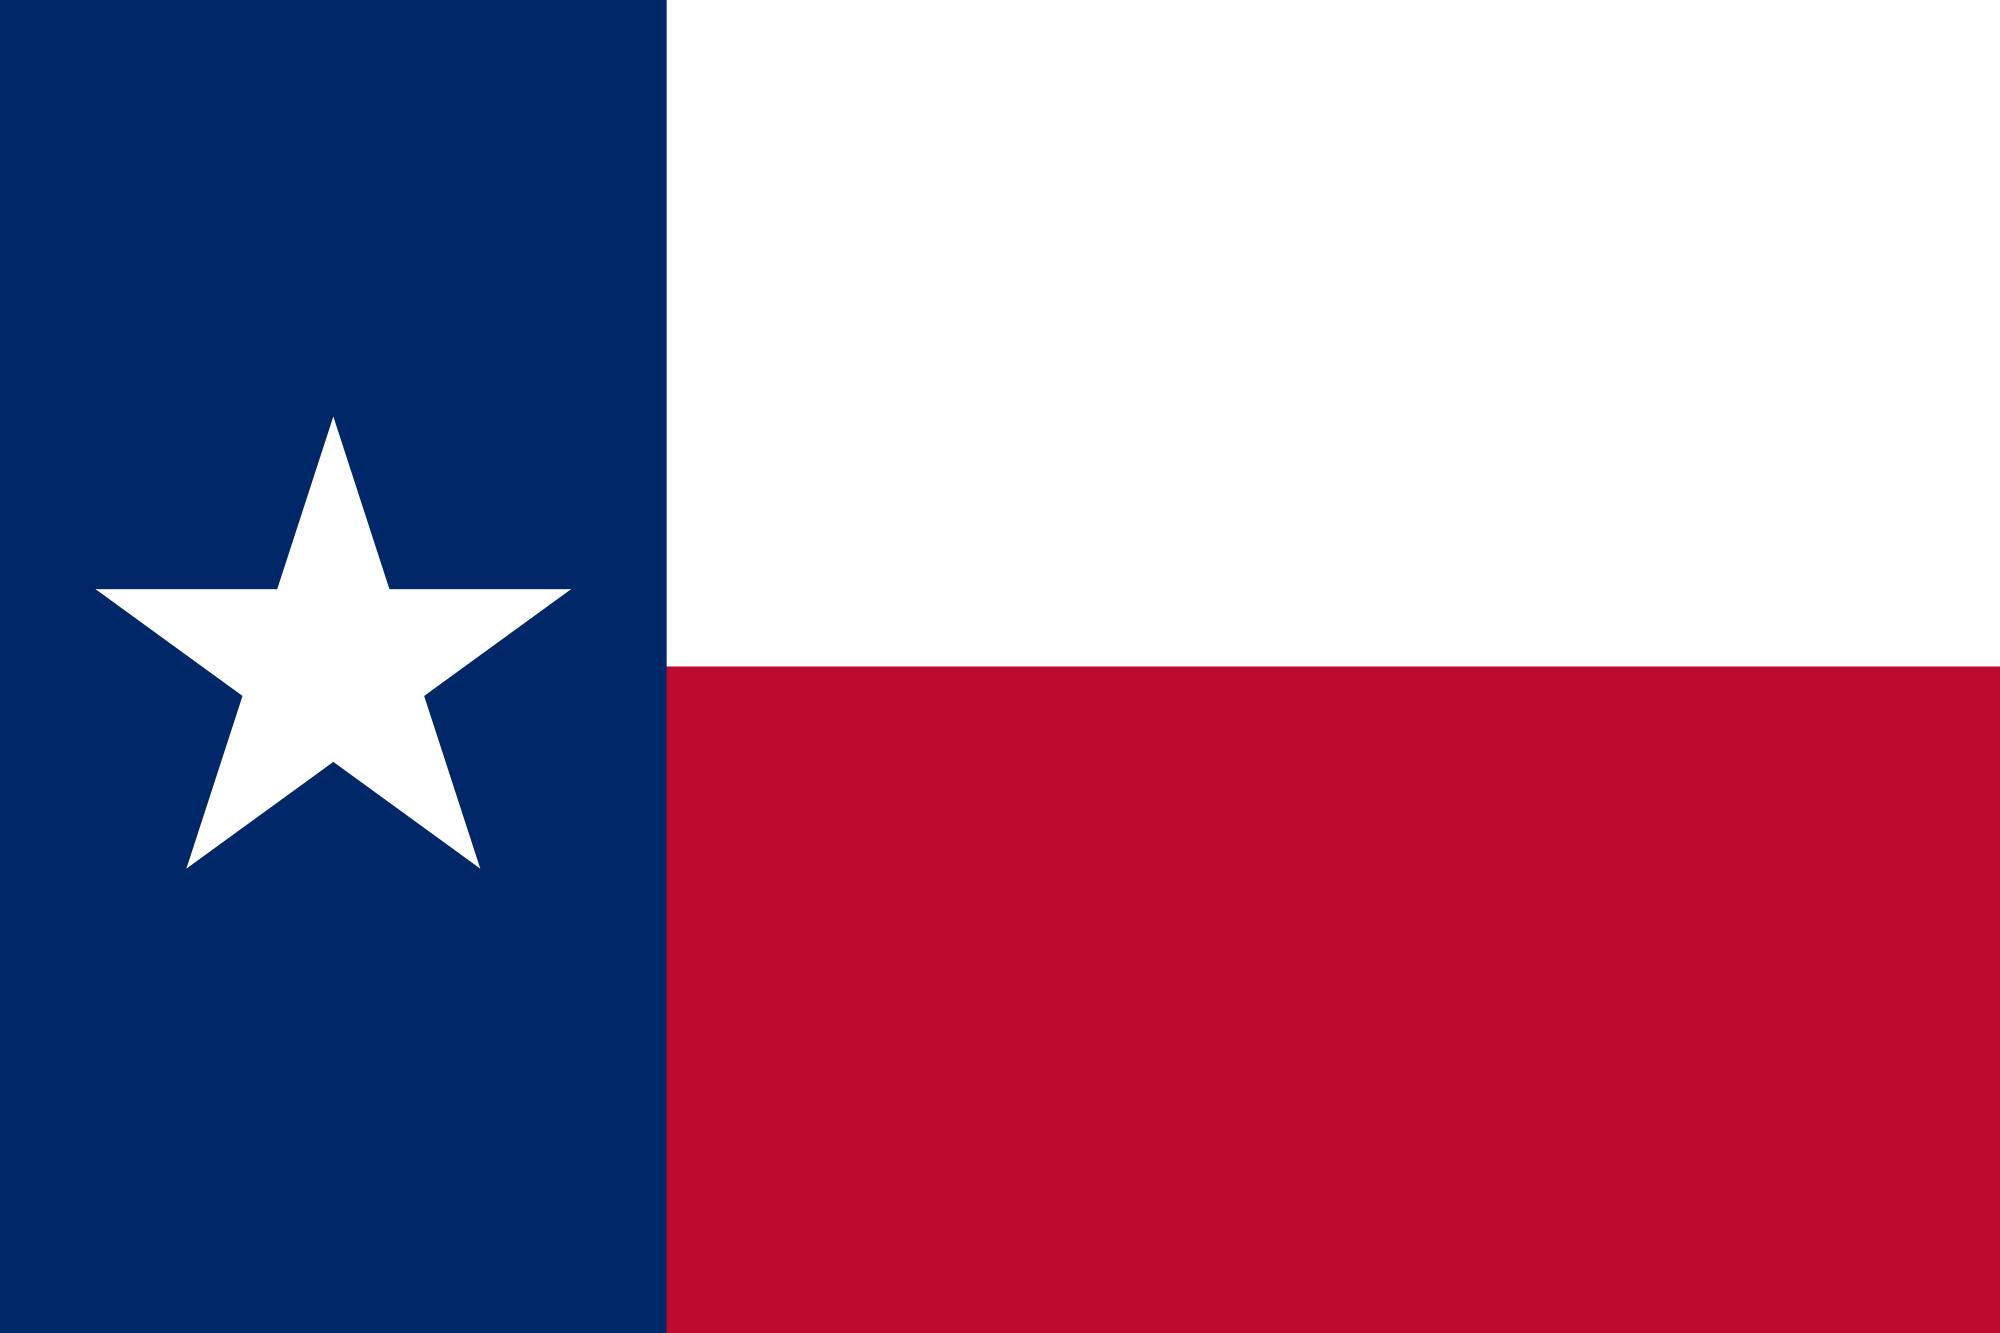 Texas   tx 06 - dallas  tx 07 - houston  tx 10 - austin  tx 22 - houston  tx 23 - el paso  tx 24 - dallas